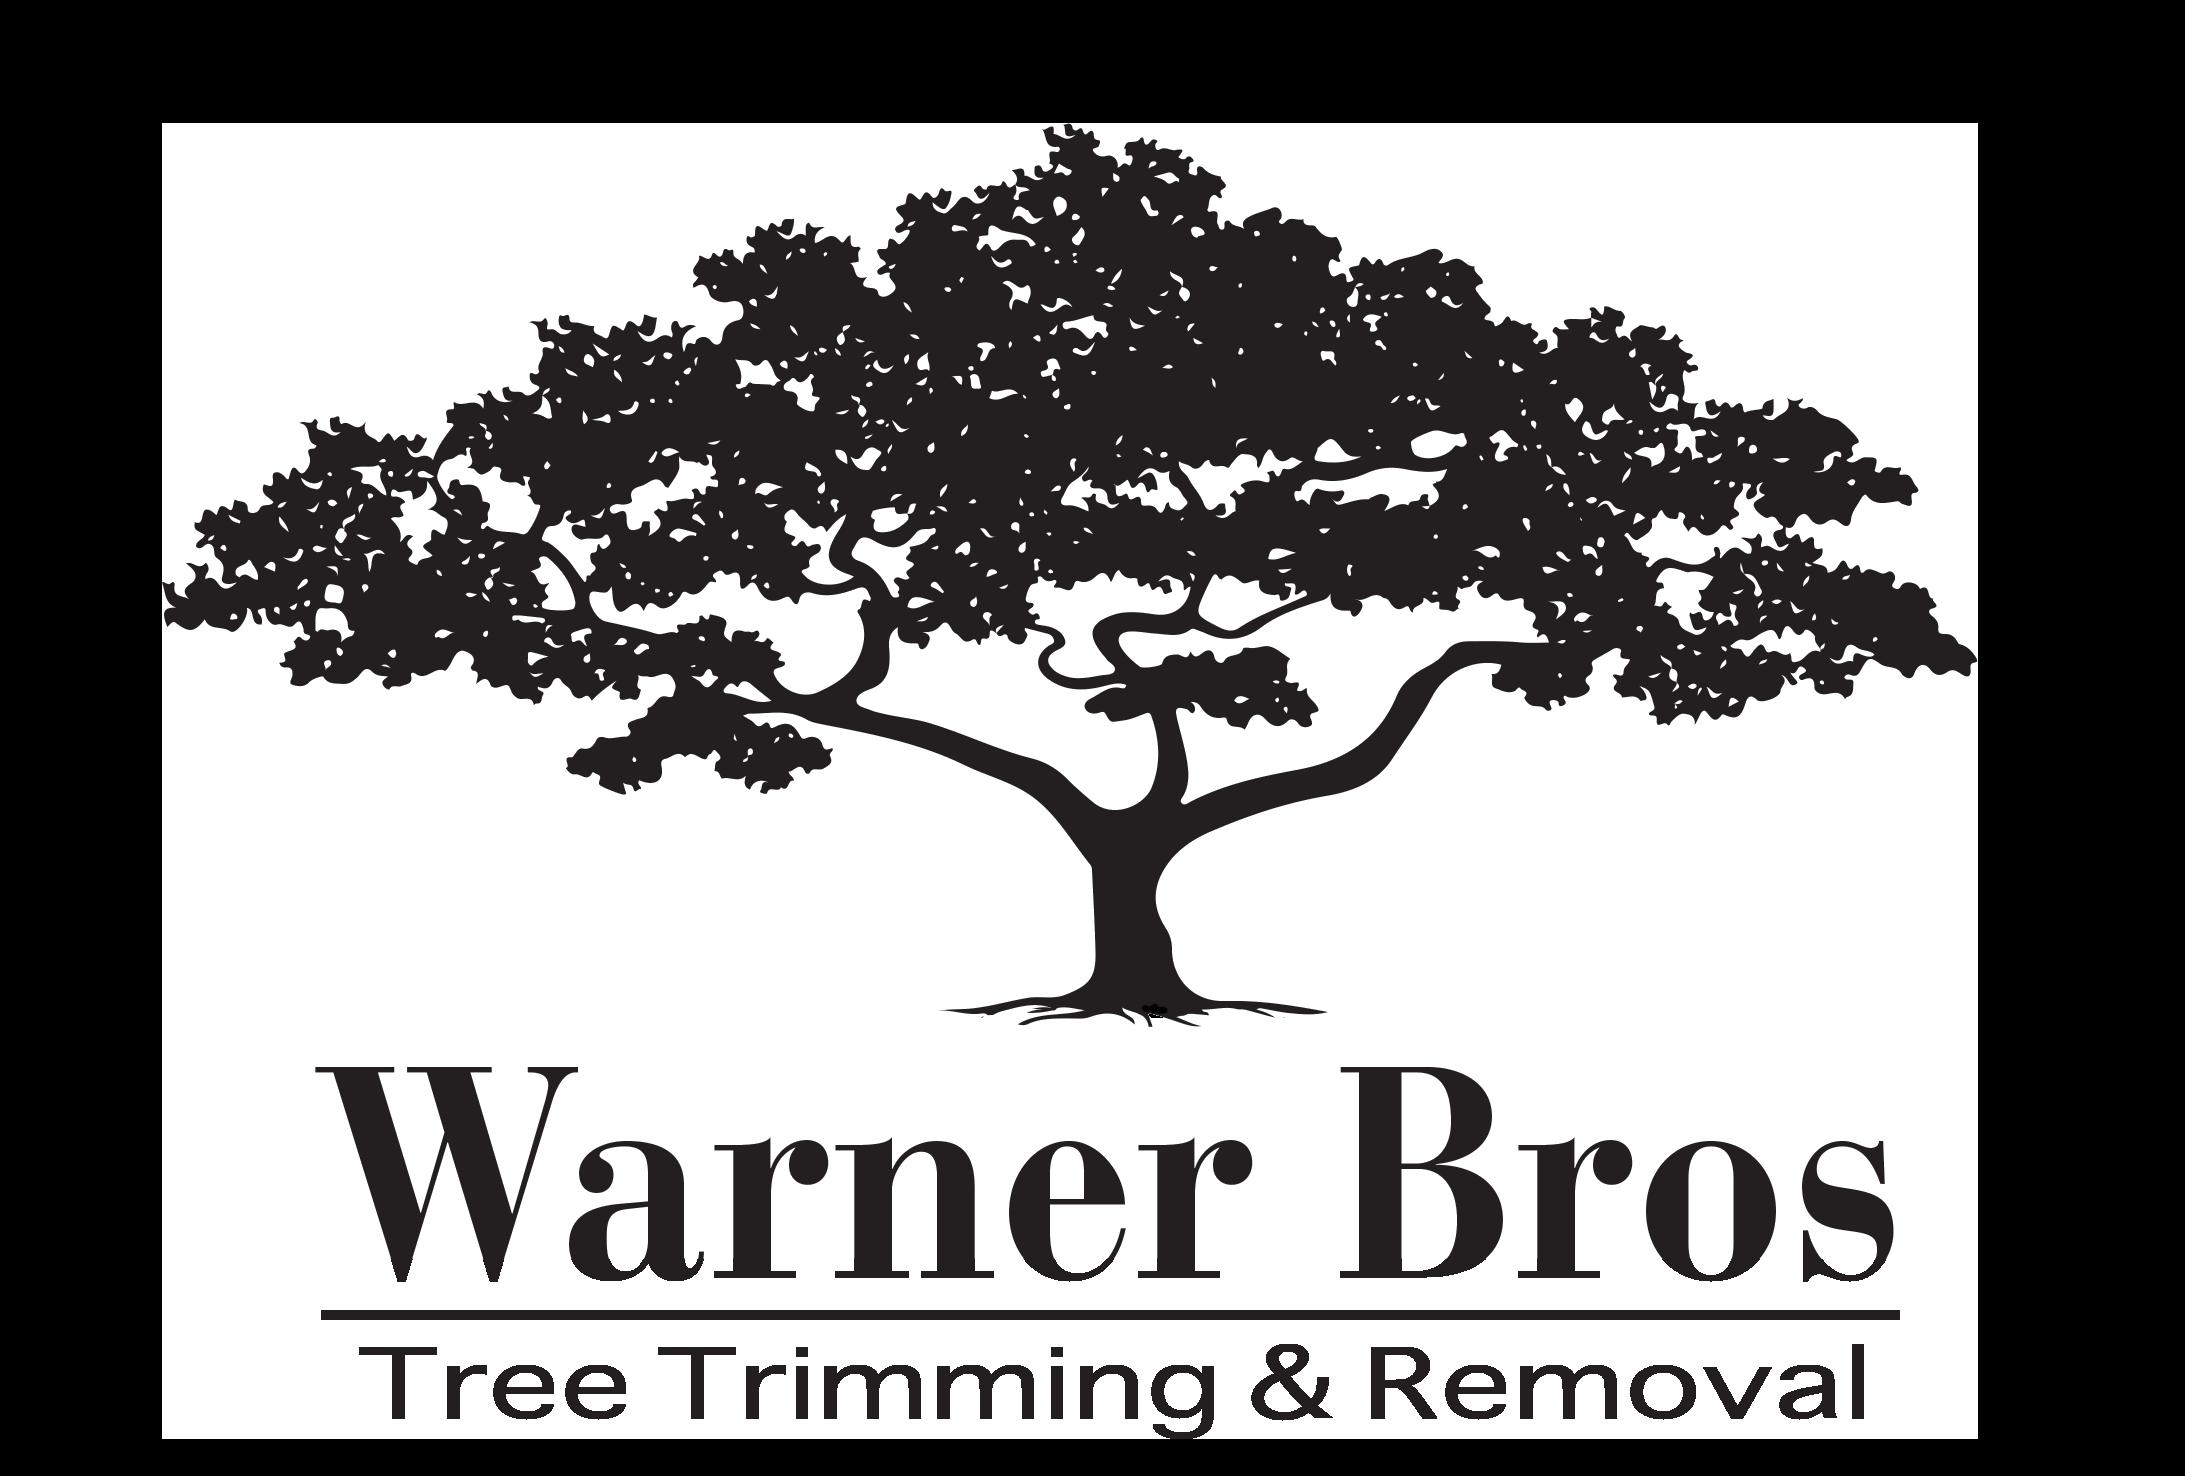 Warner Bros Tree Trimming & Removal